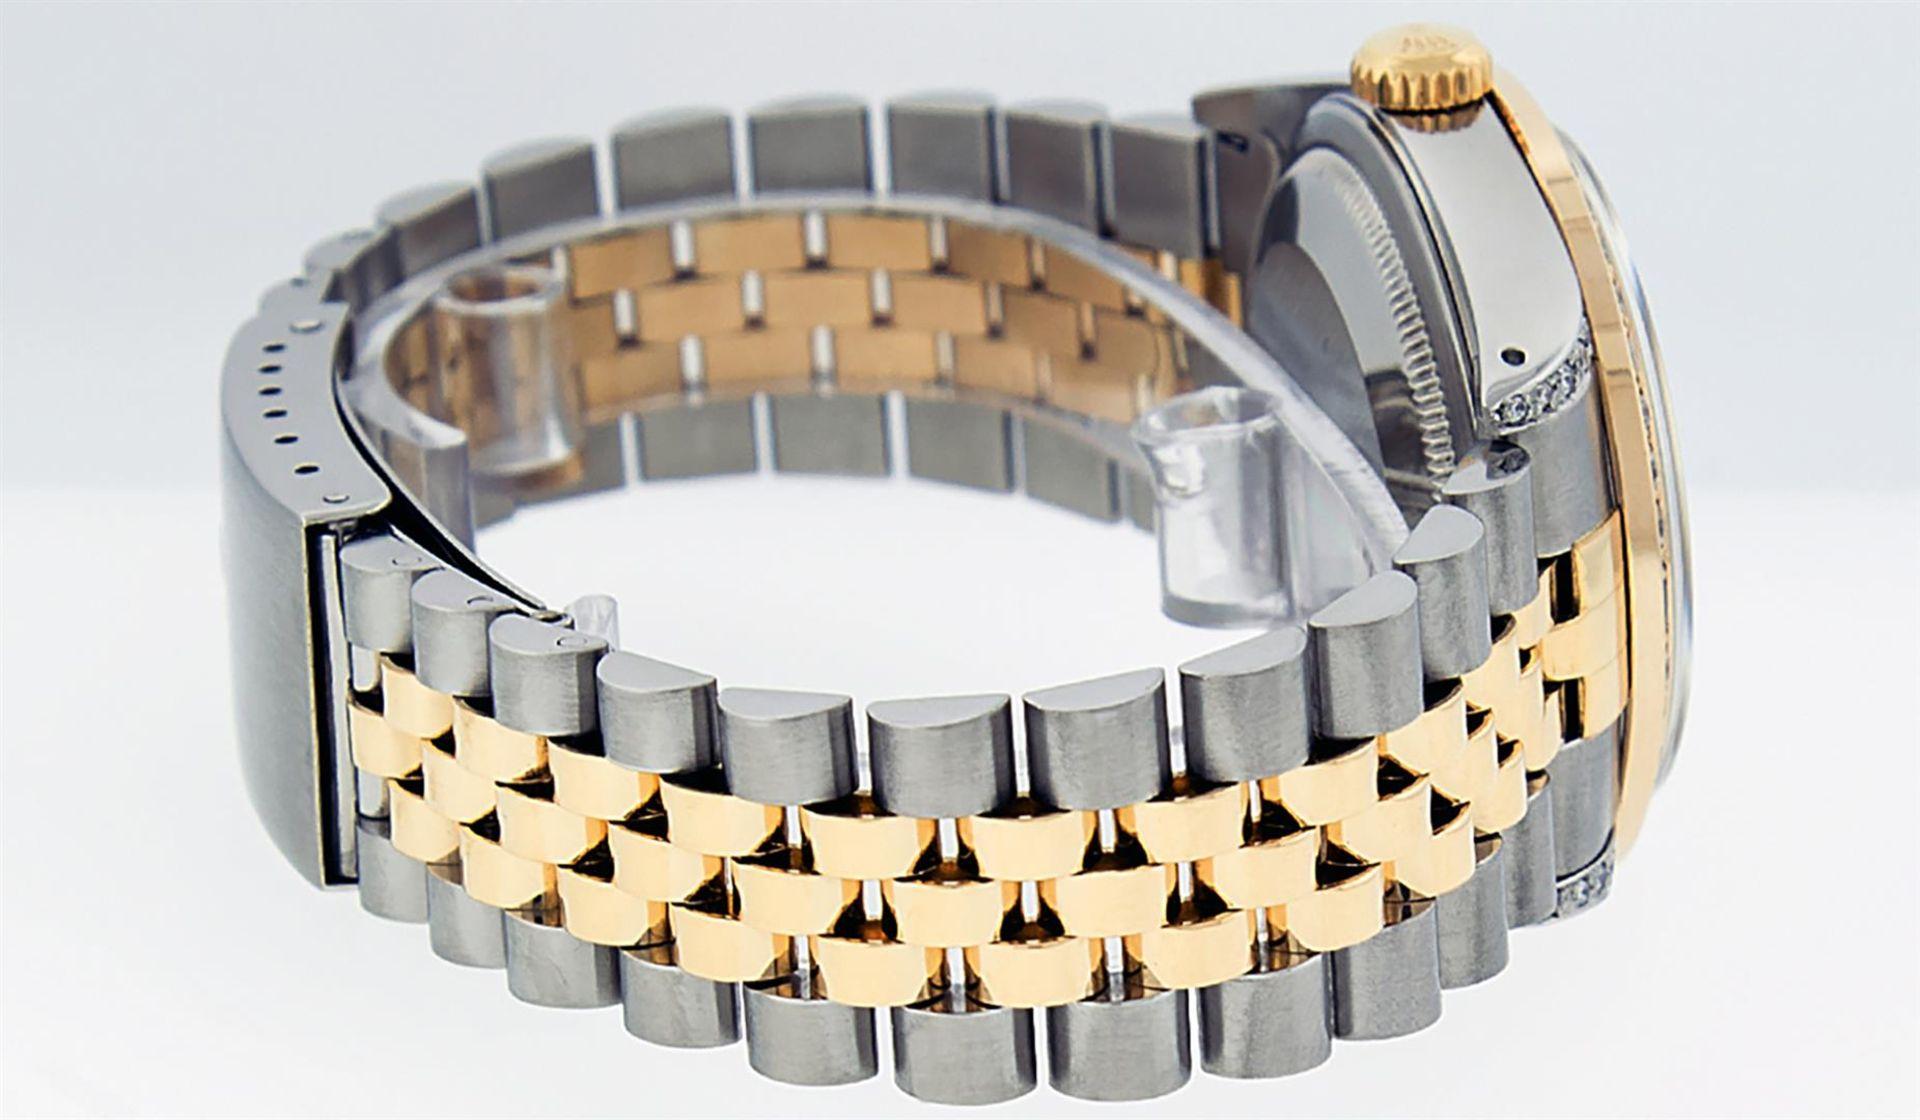 Rolex Mens 2 Tone Blue Vignette String Diamond Lugs Datejust Wristwatch - Image 3 of 8